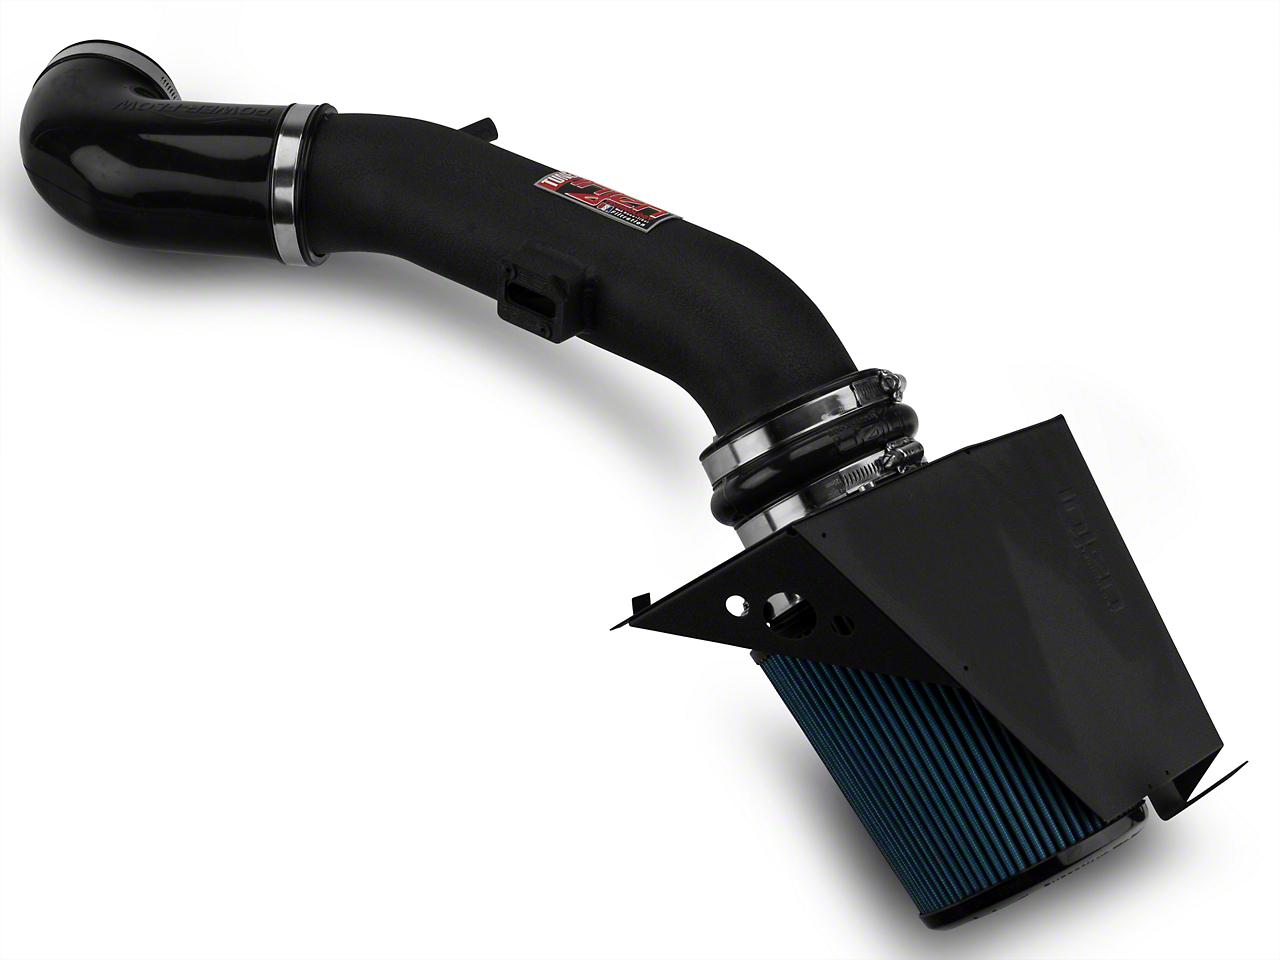 Injen Power-Flow Cold Air Intake - Wrinkle Black (2012 5.0L F-150)